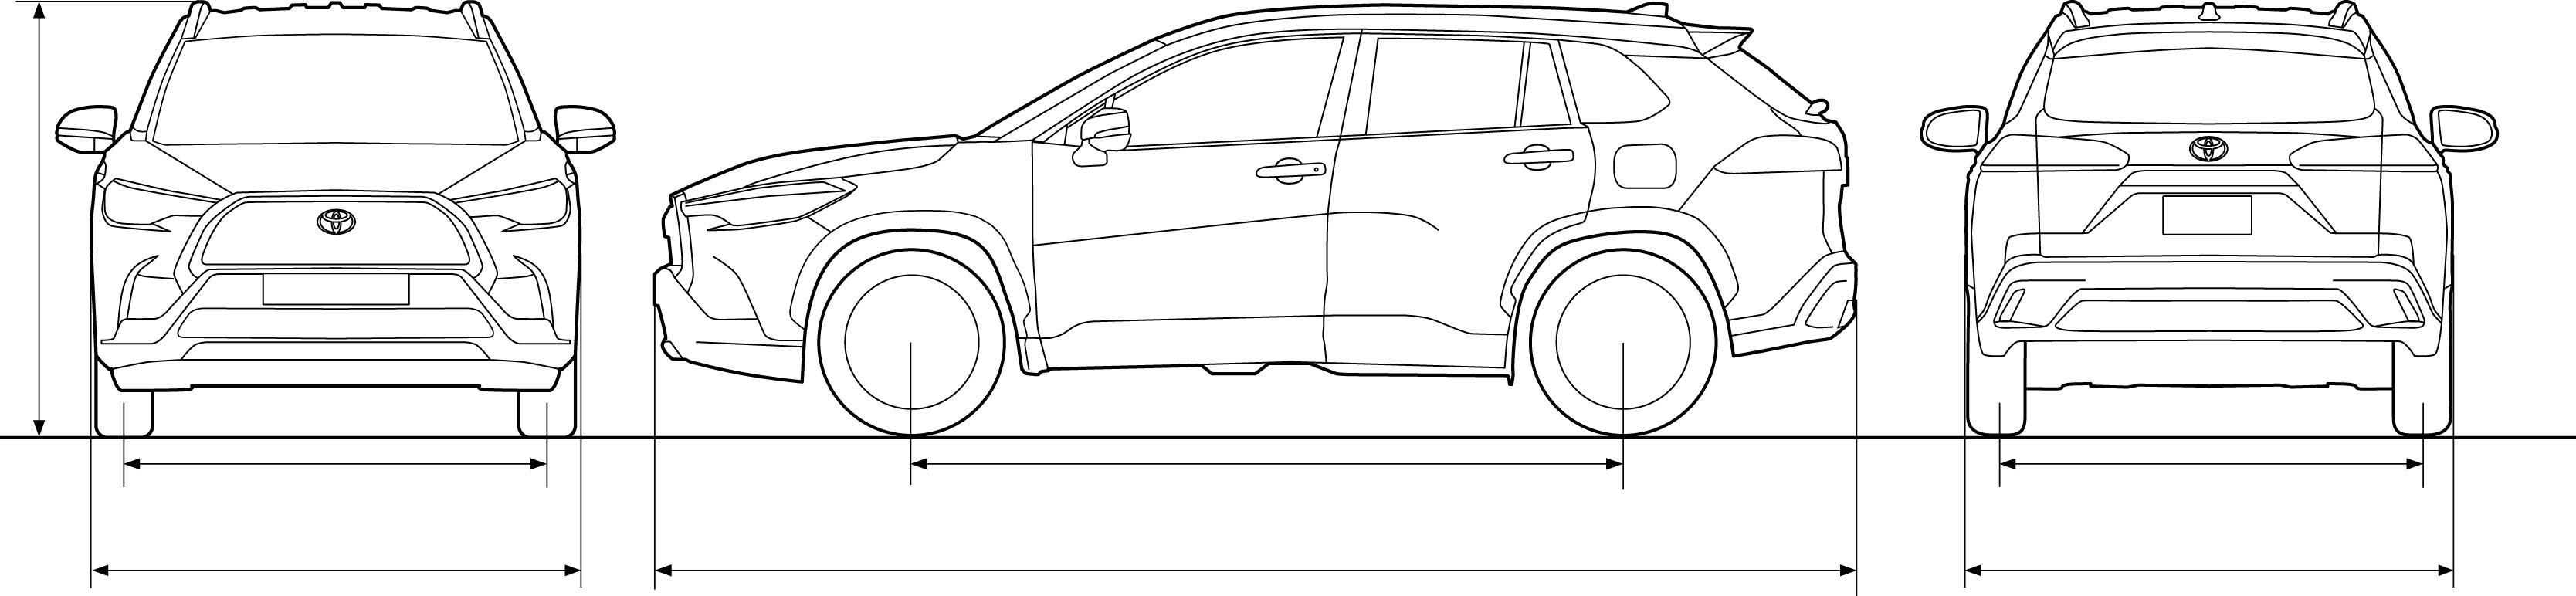 Ficha técnica | Corolla Cross Híbrido Auto Recargable